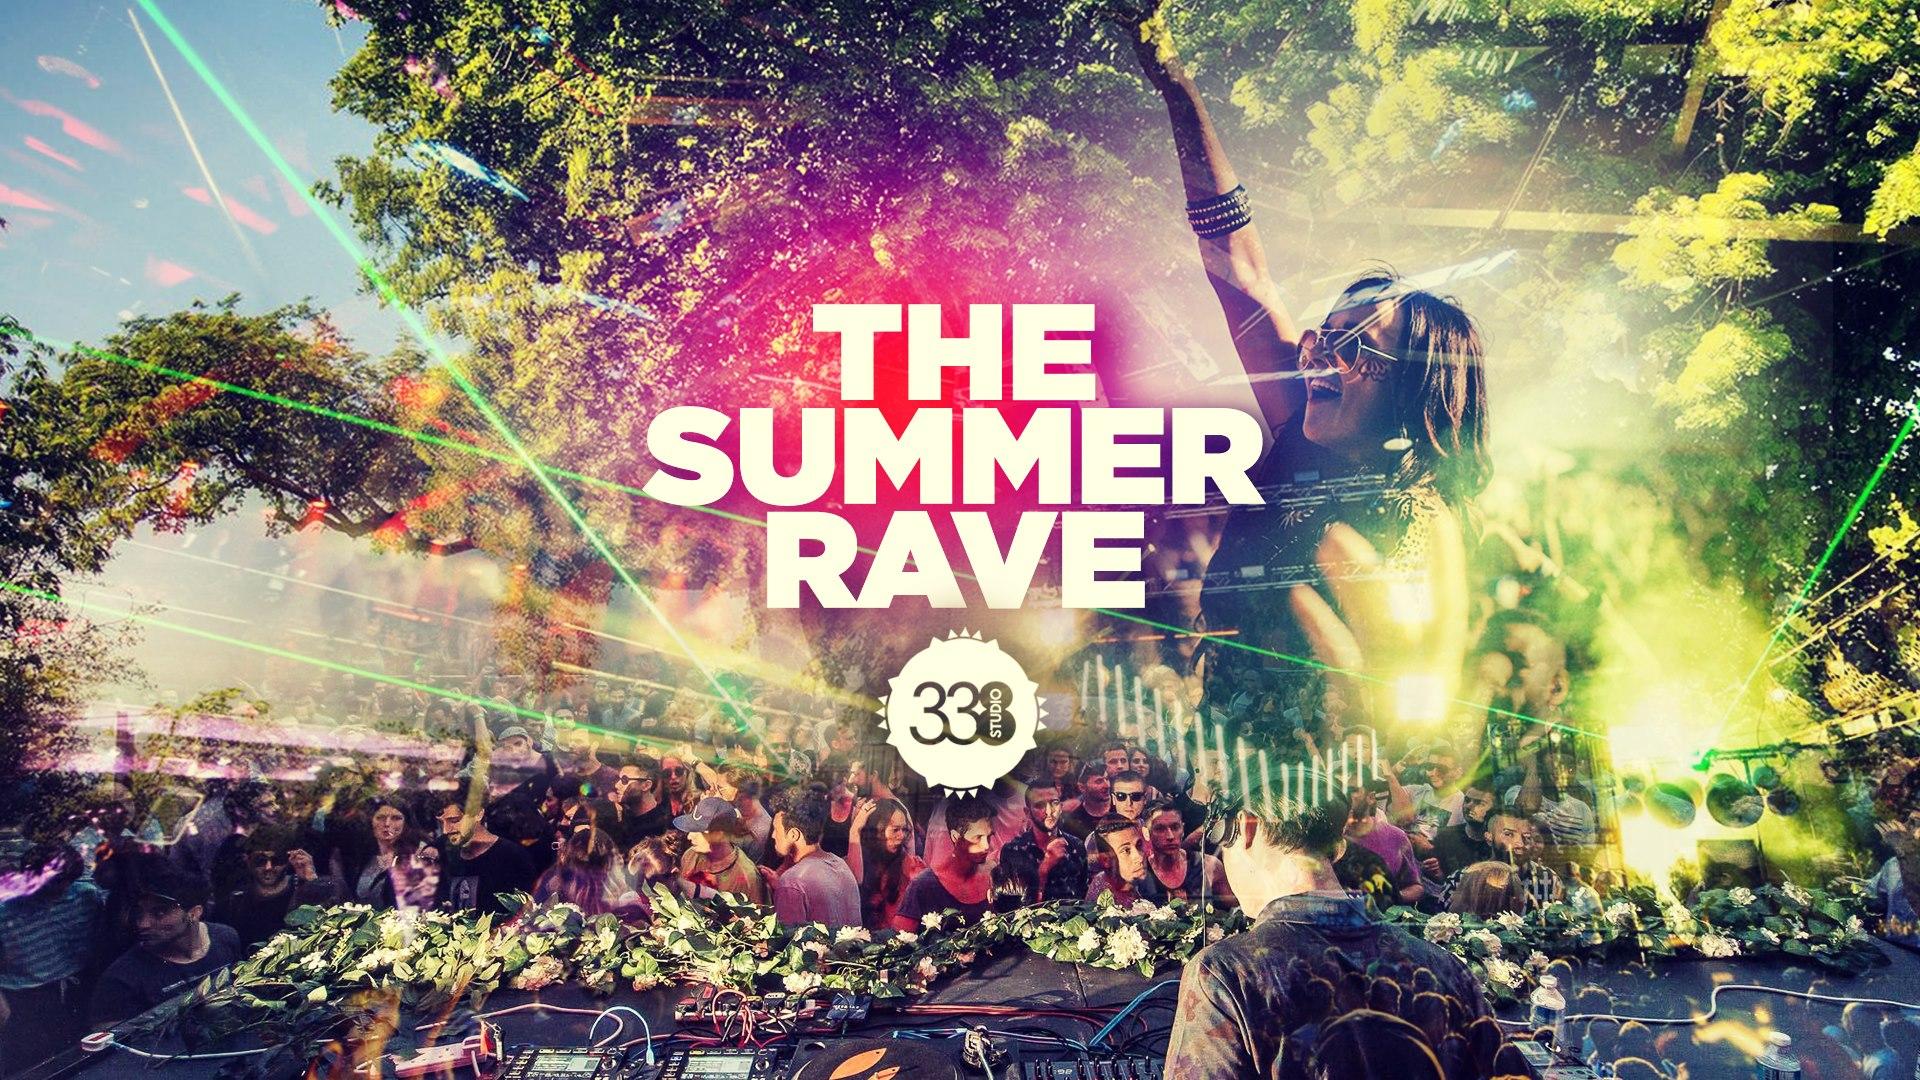 The Summer Rave 2019 at Studio 338 – Tonight 10pm ☀️